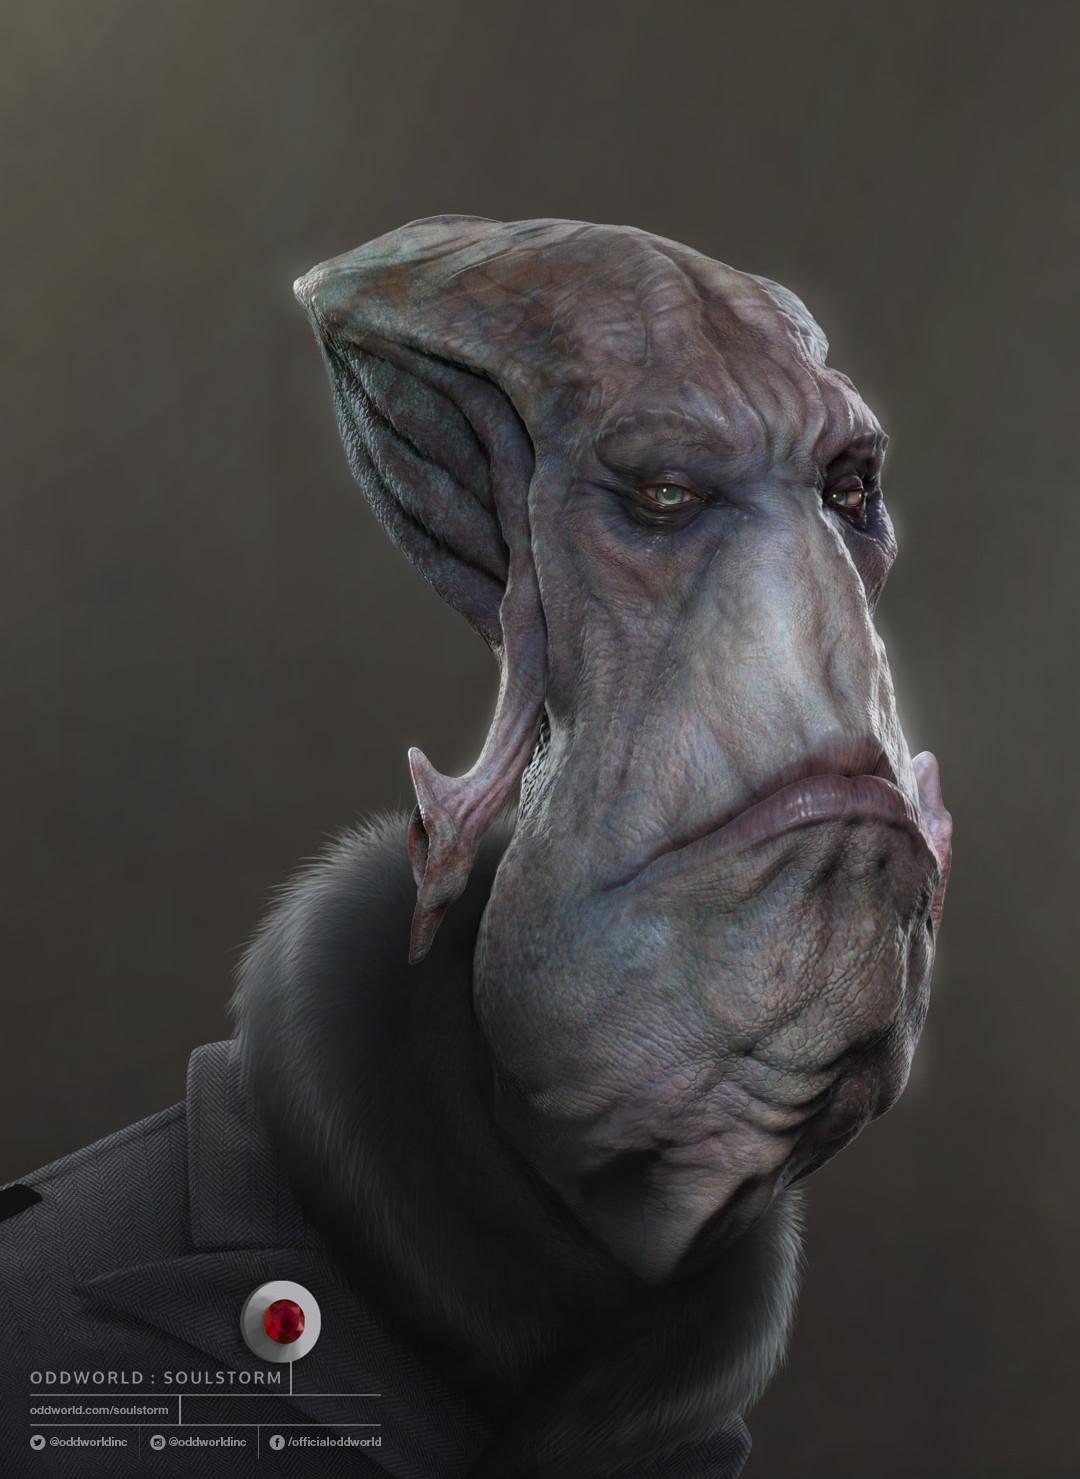 Oddworld: Soulstorm character portraits, Glukkon 1